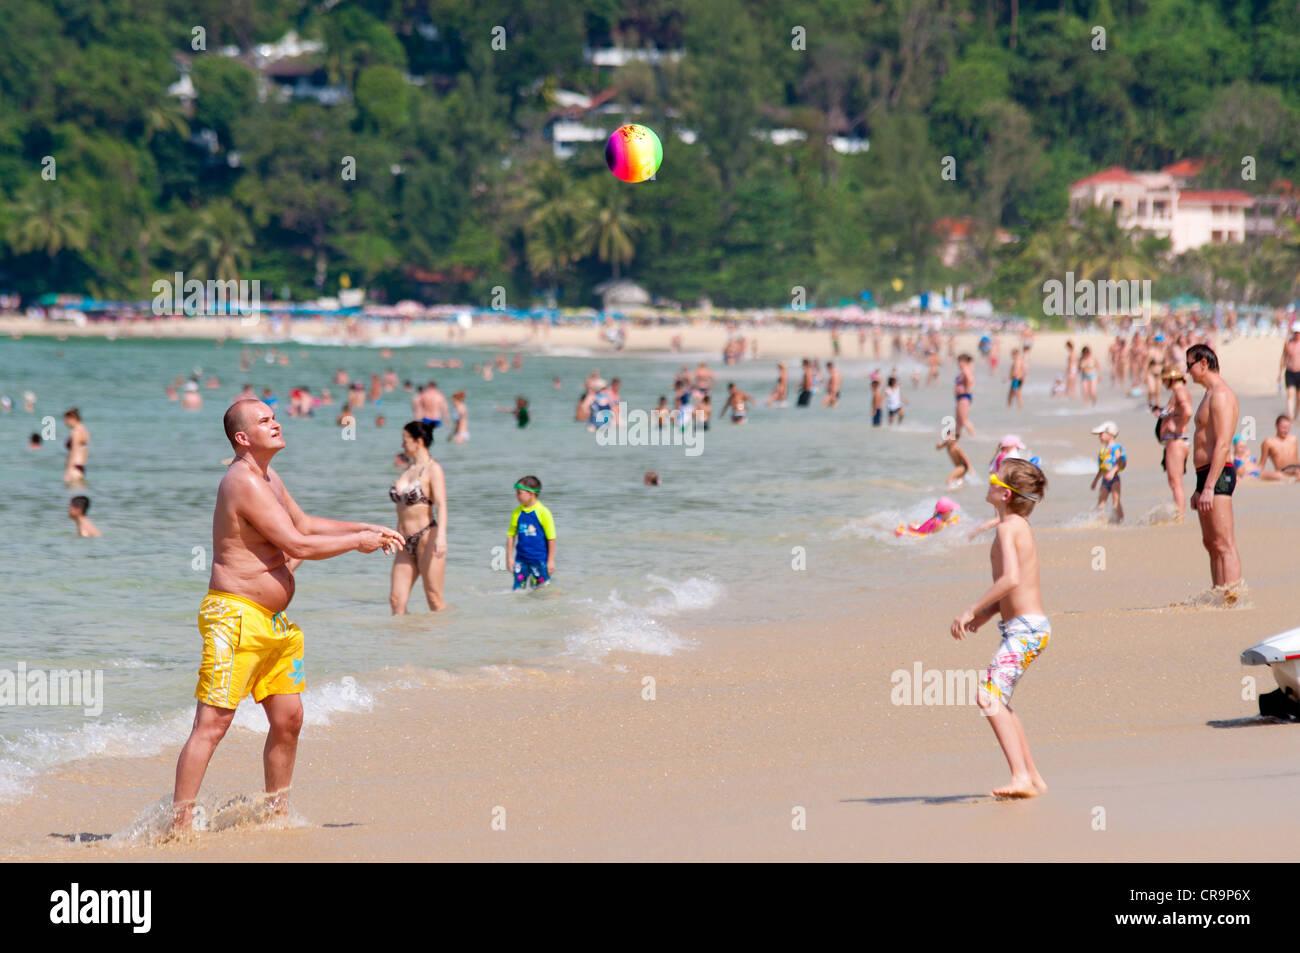 Karon beach games in Phuket, Thailand - Stock Image